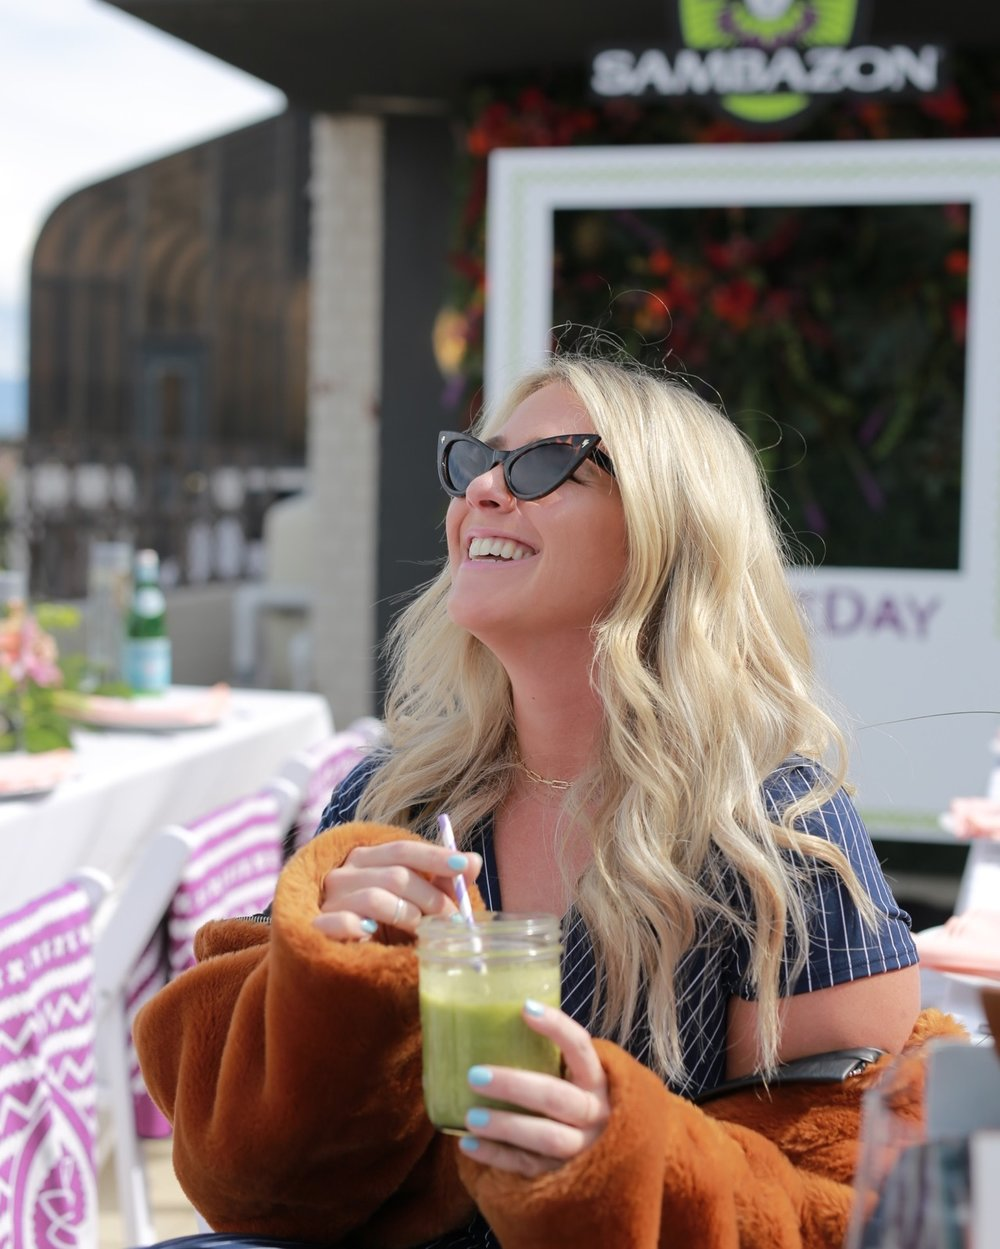 Fitty Britty enjoying a Sambazon smoothie!